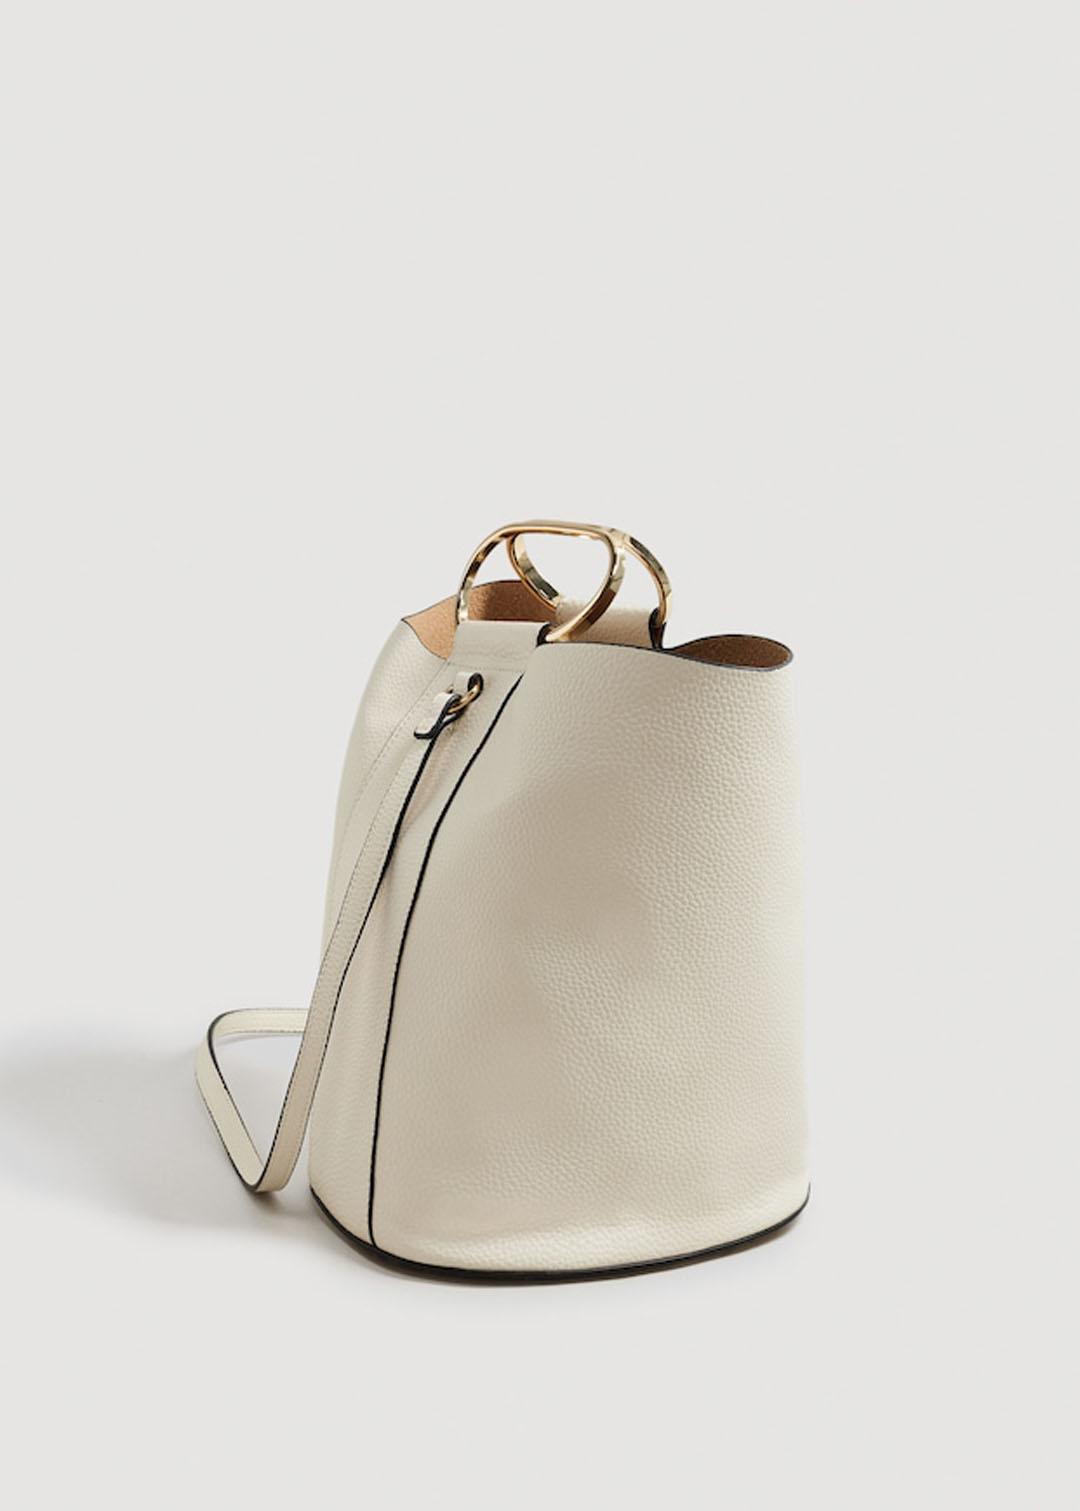 Mango white bucket bag